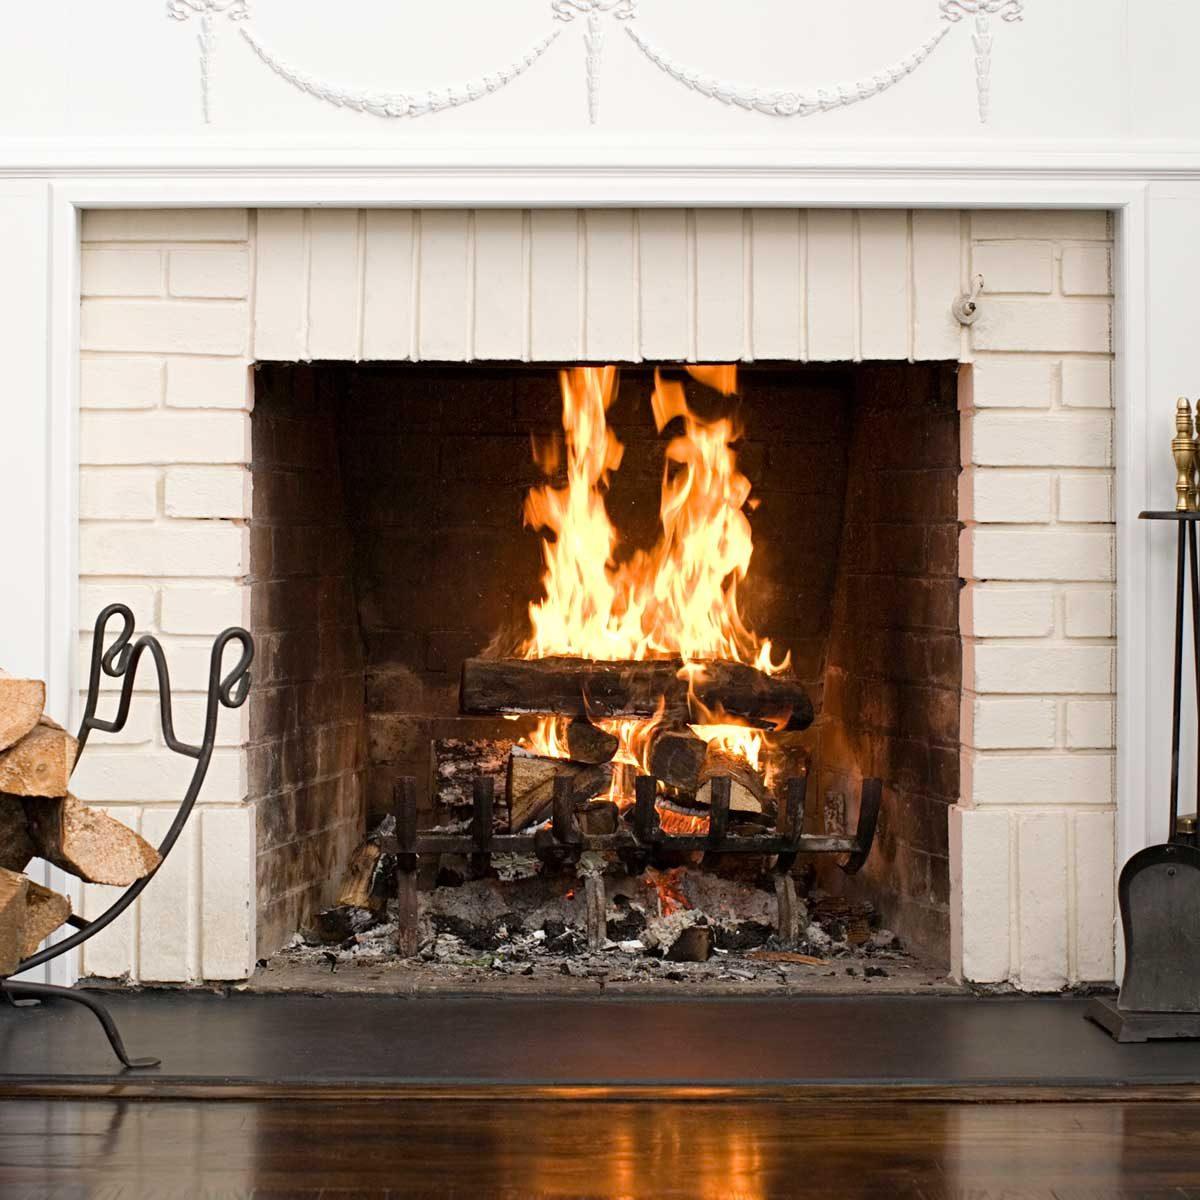 Newly Replaced Fireplace